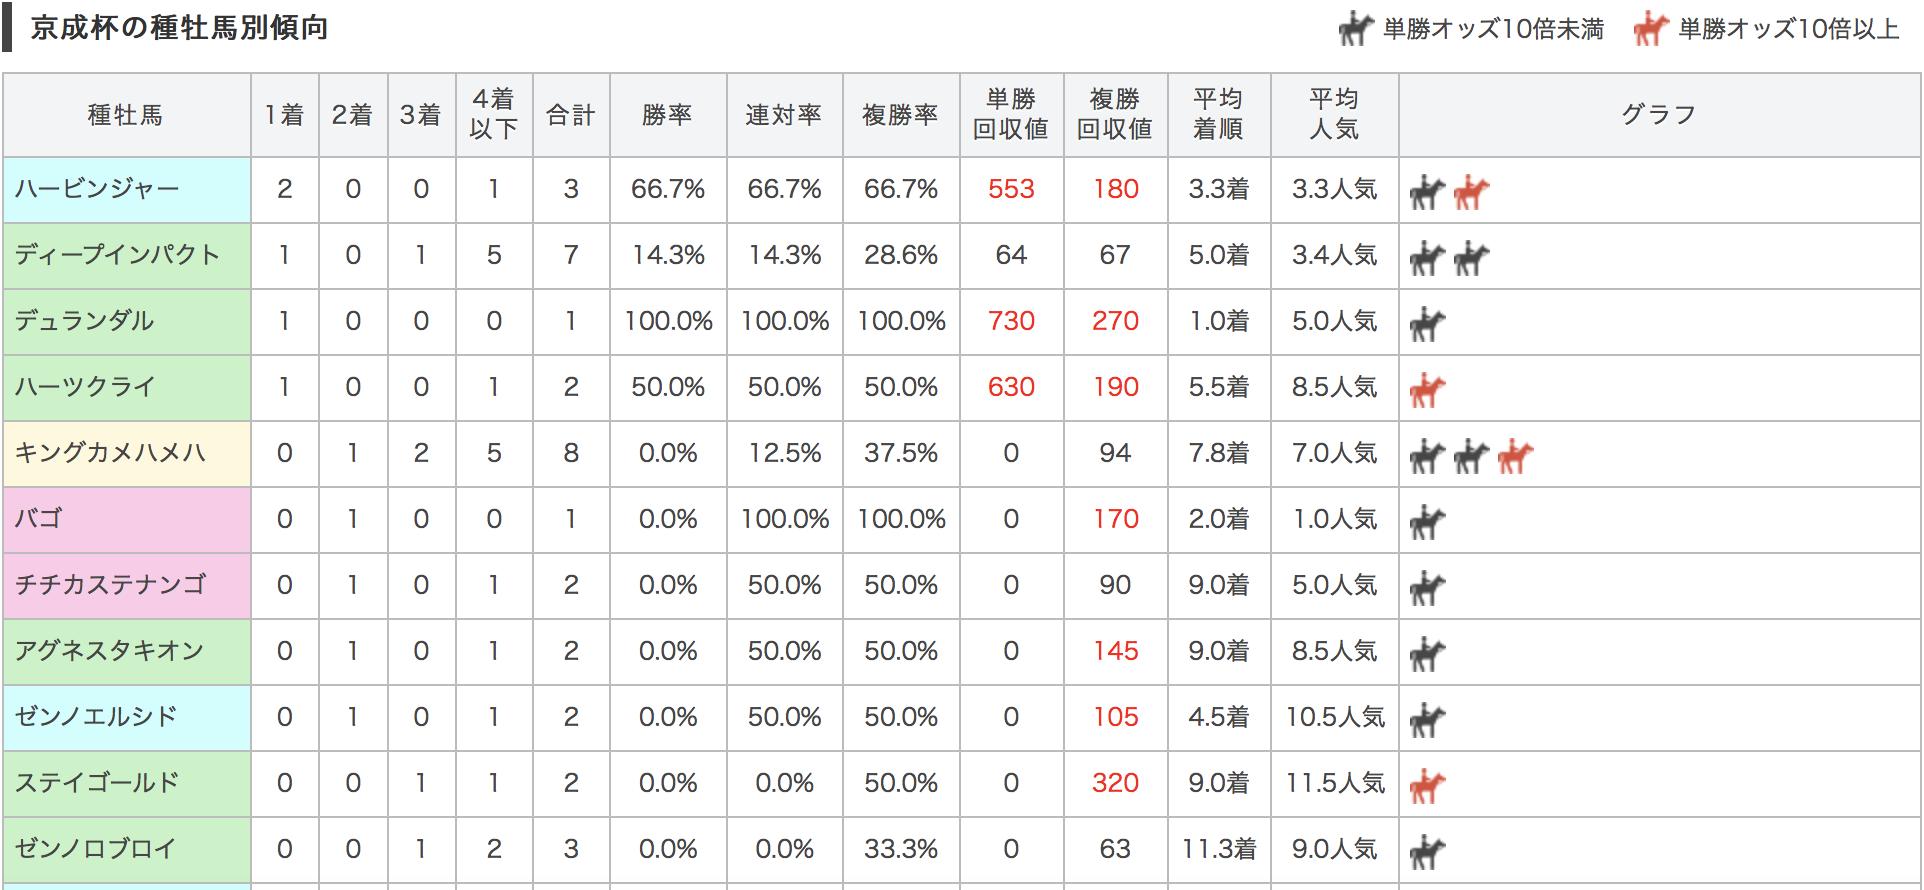 京成杯2017種牡馬別データ